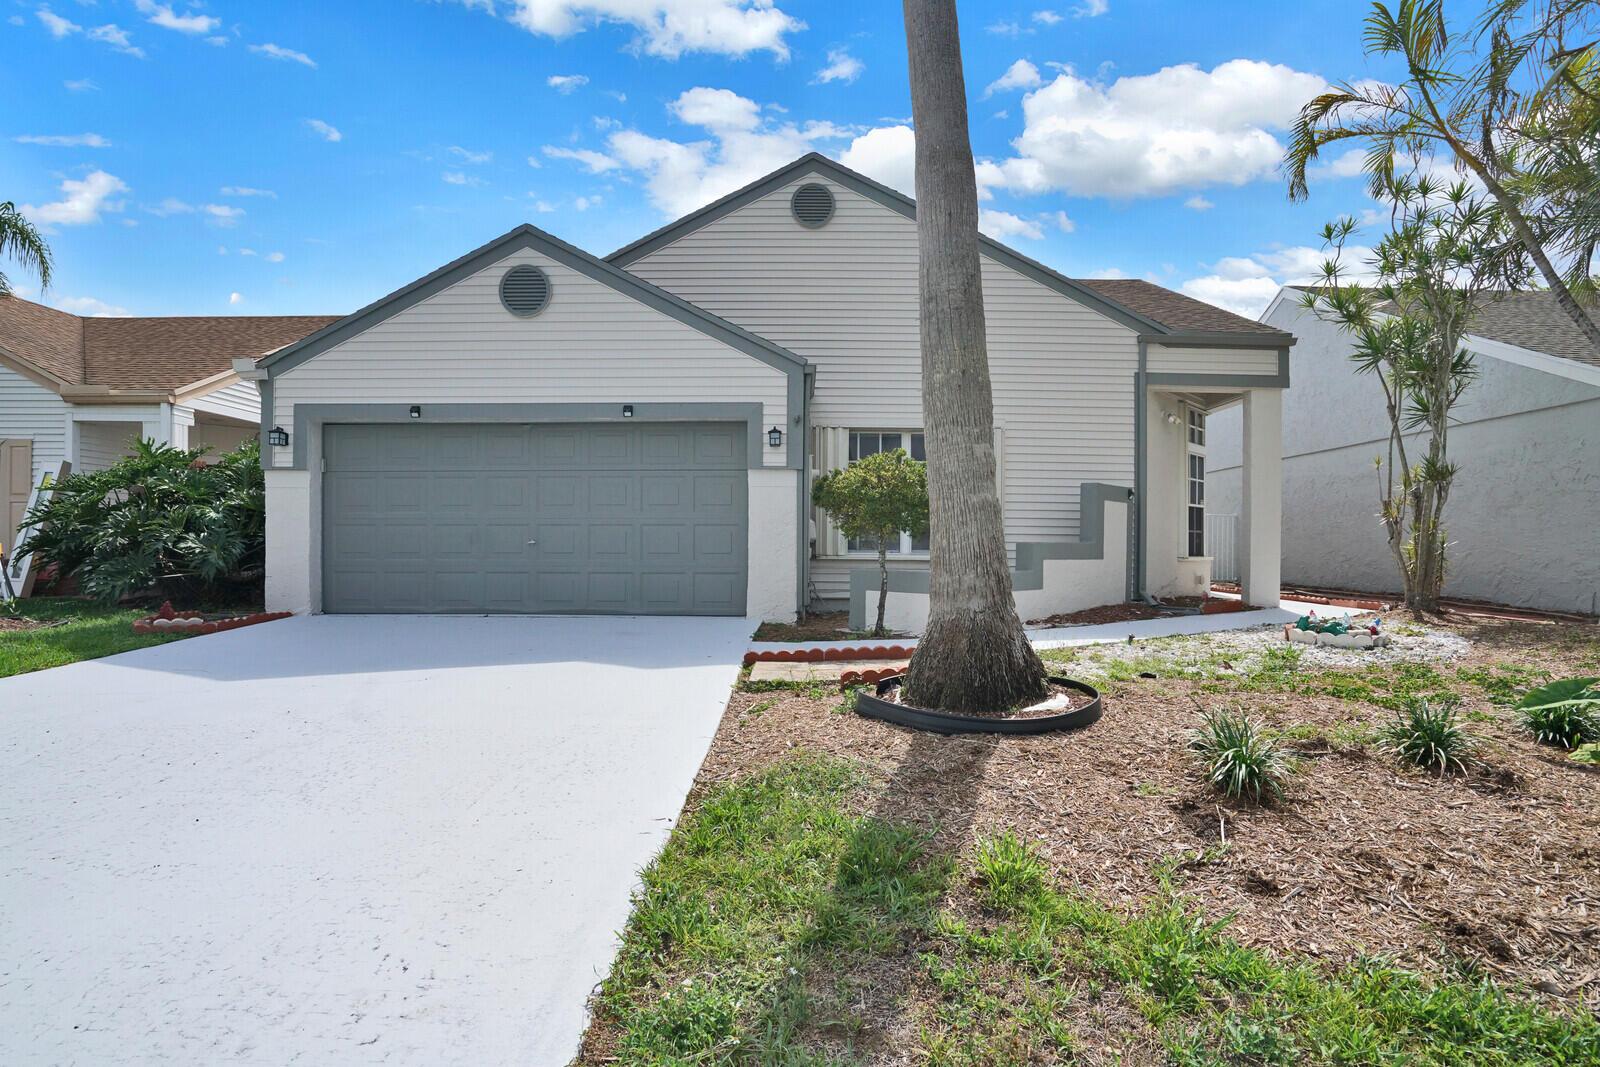 23030 Floralwood Lane Boca Raton, FL 33433